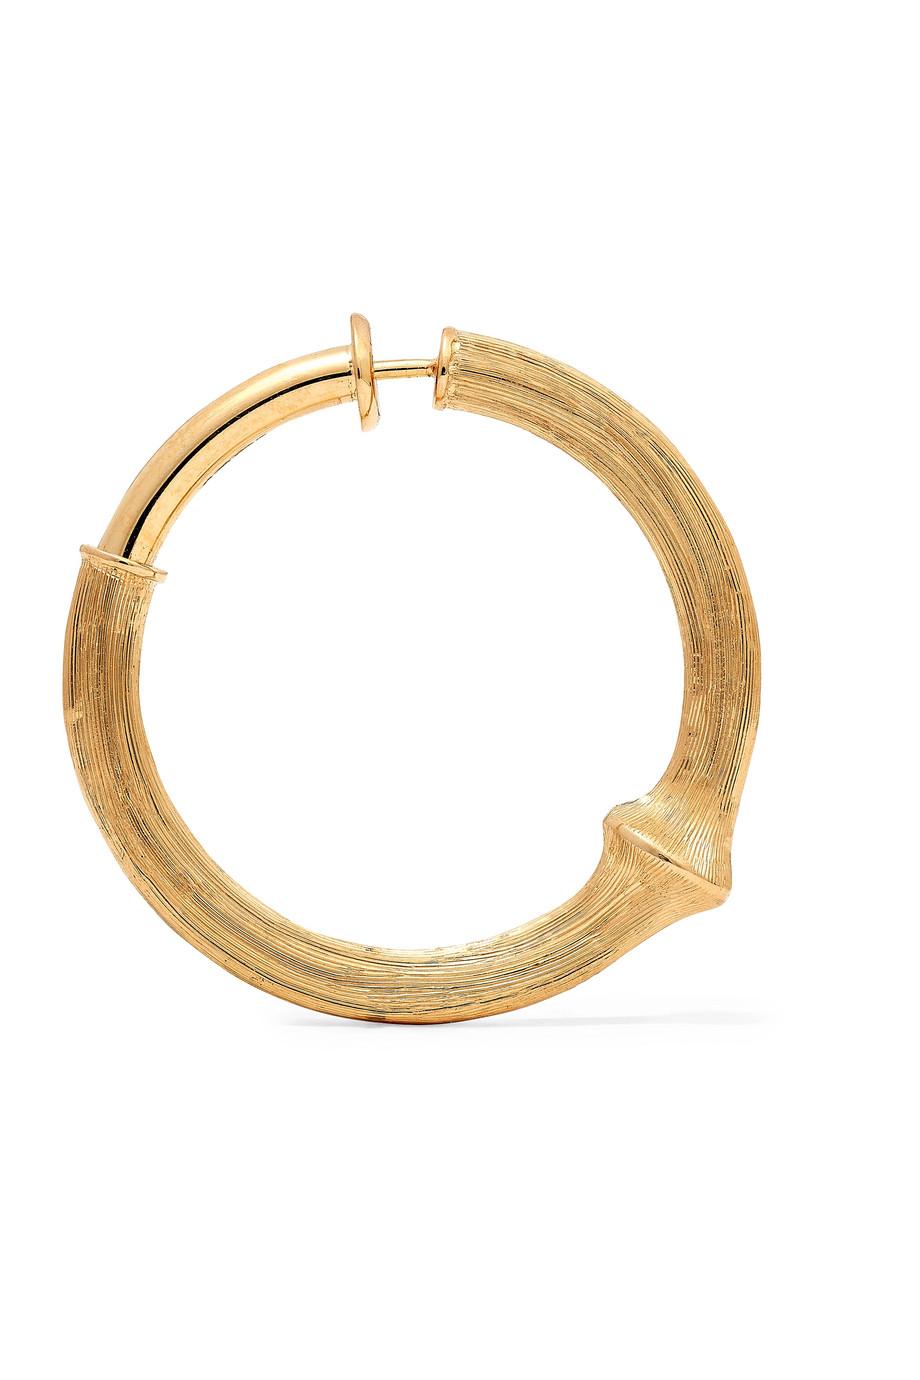 OLE LYNGGAARD COPENHAGEN Nature large 18-karat gold hoop earring